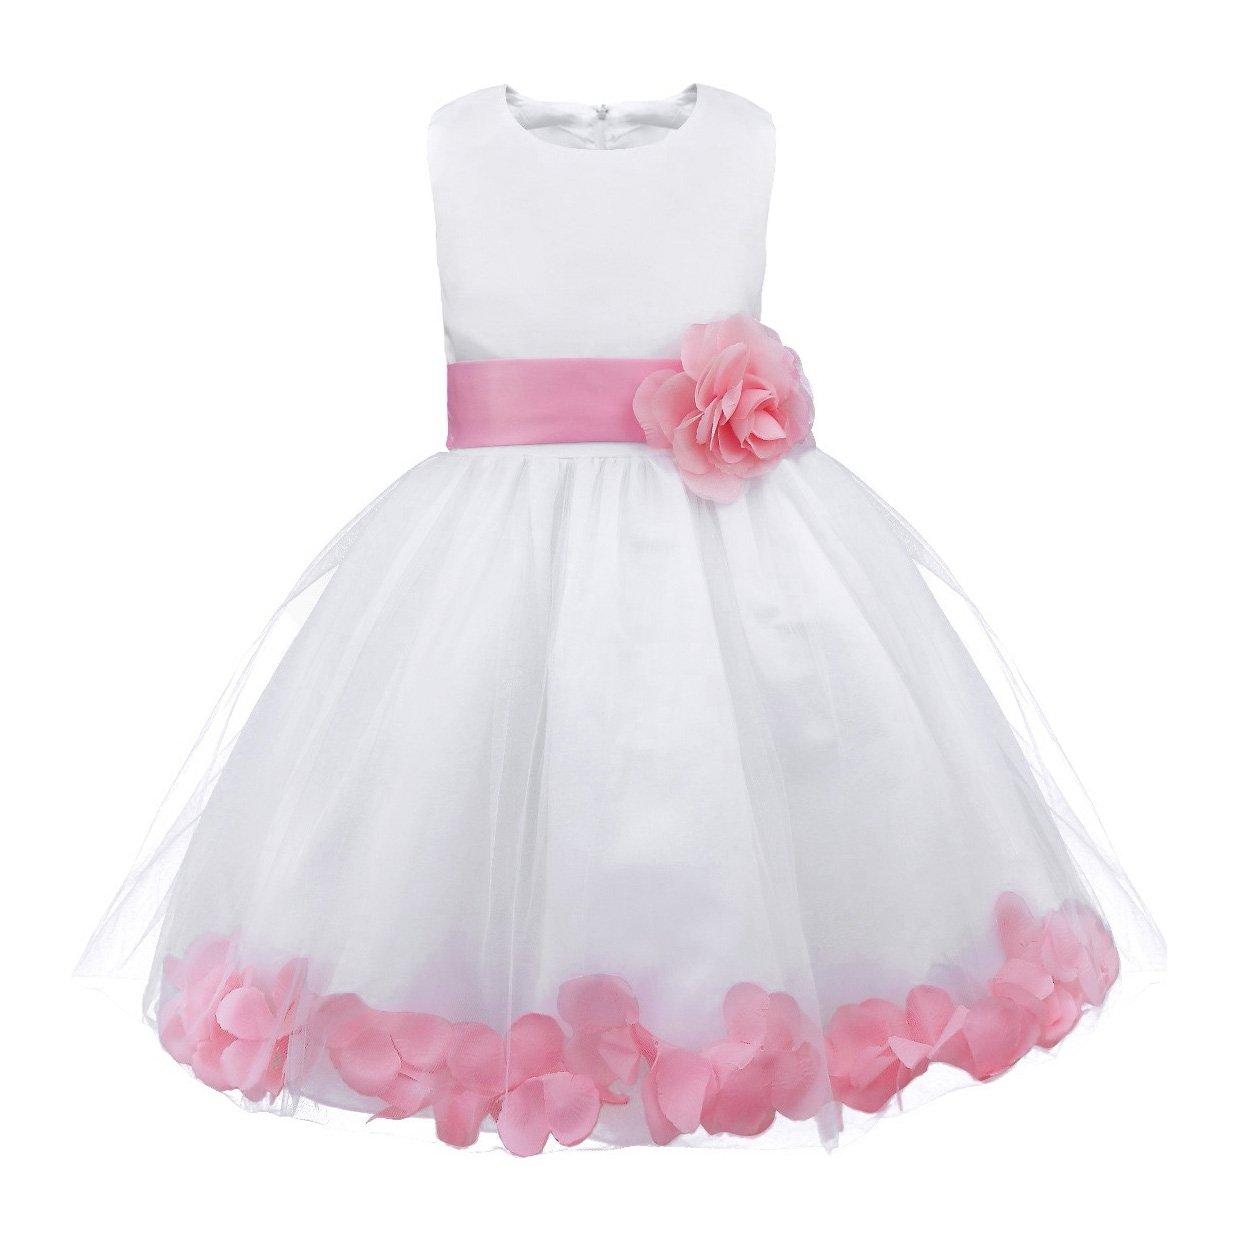 Toddler dress pink and white amazon iiniim girls petals tulle princess wedding pageant party flower girl dress mightylinksfo